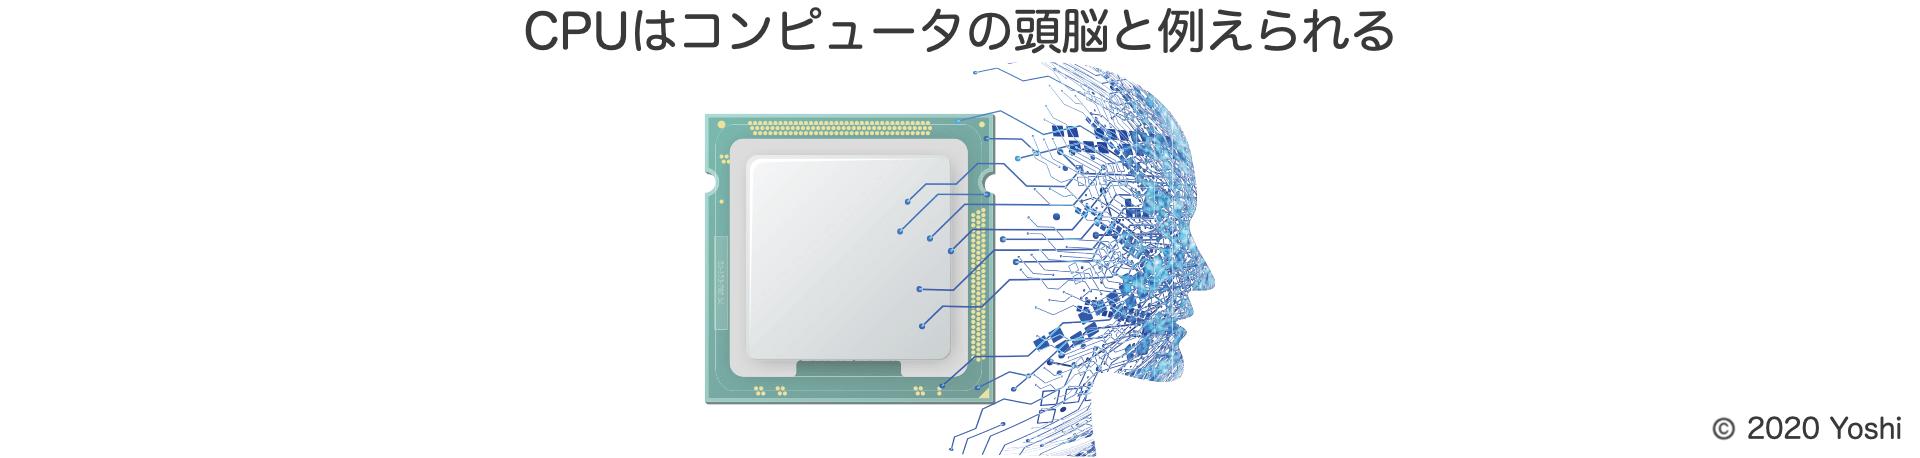 CPUはコンピューターの頭脳と例えられる